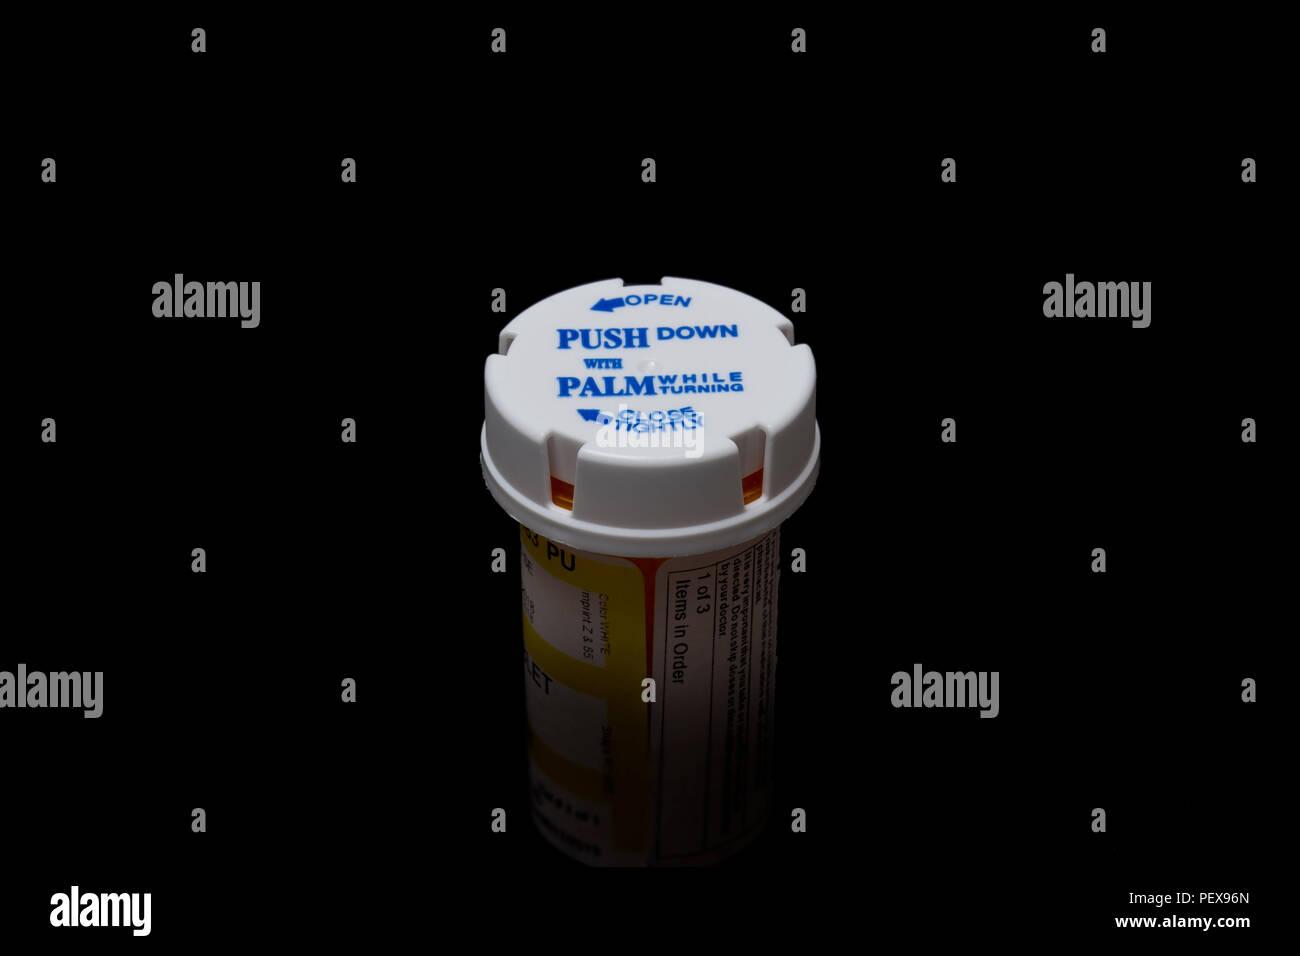 A prescription bottle with a child-proof cap. - Stock Image